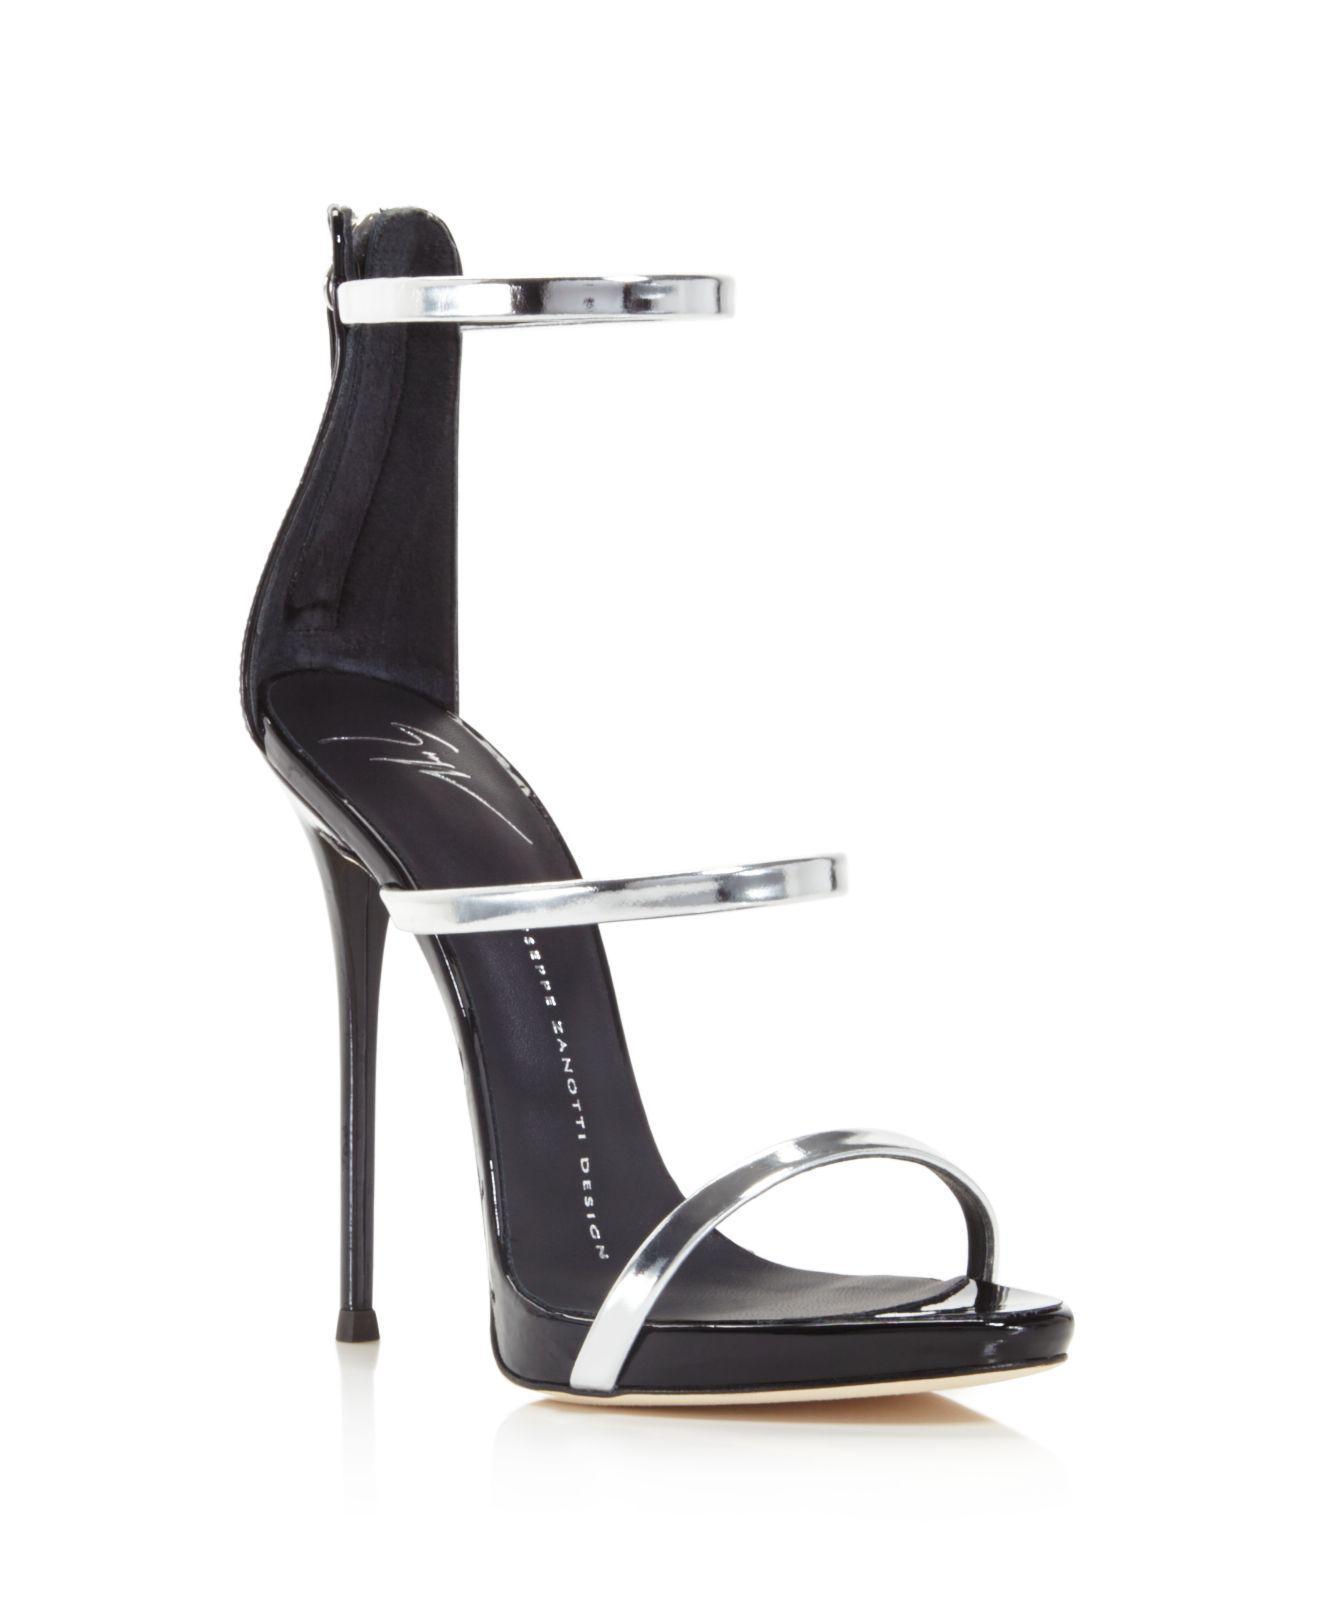 ccc94a385856e Giuseppe Zanotti Harmony Metallic Triple Strap High Heel Sandals in ...